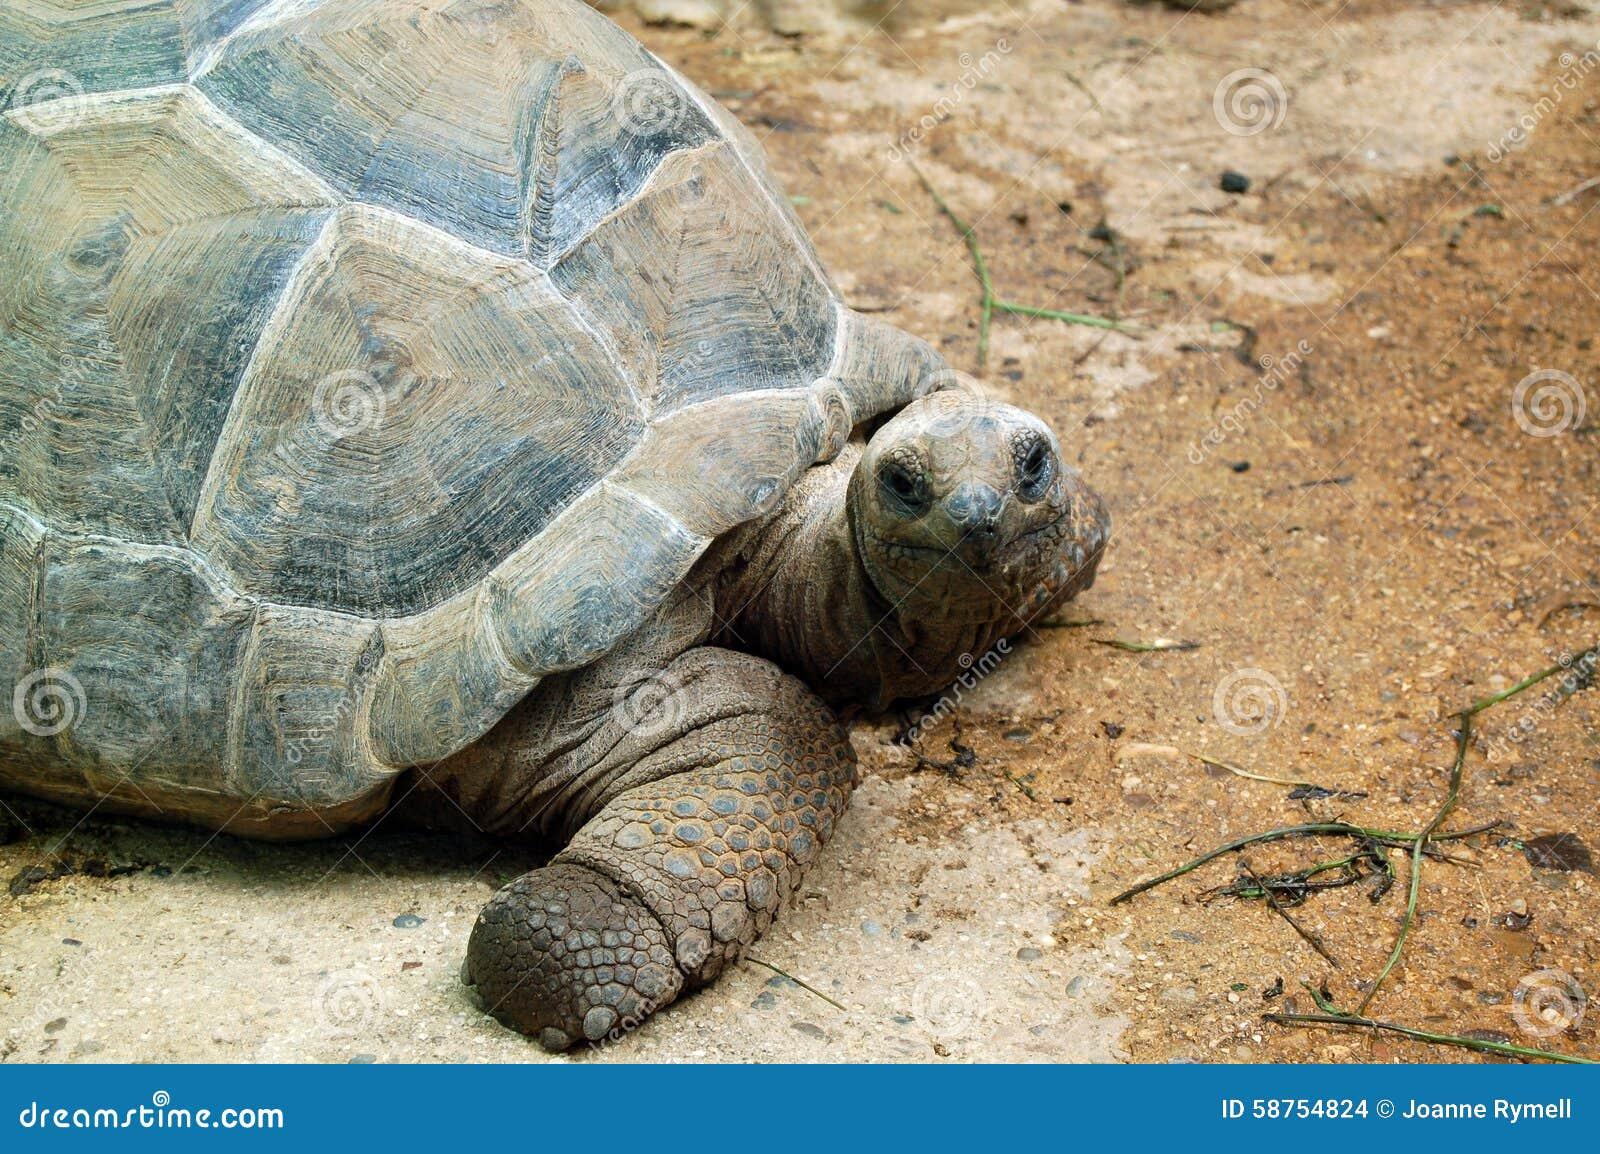 Aldabra Giant Tortoise Of The Seychelles Stock Photo - Image